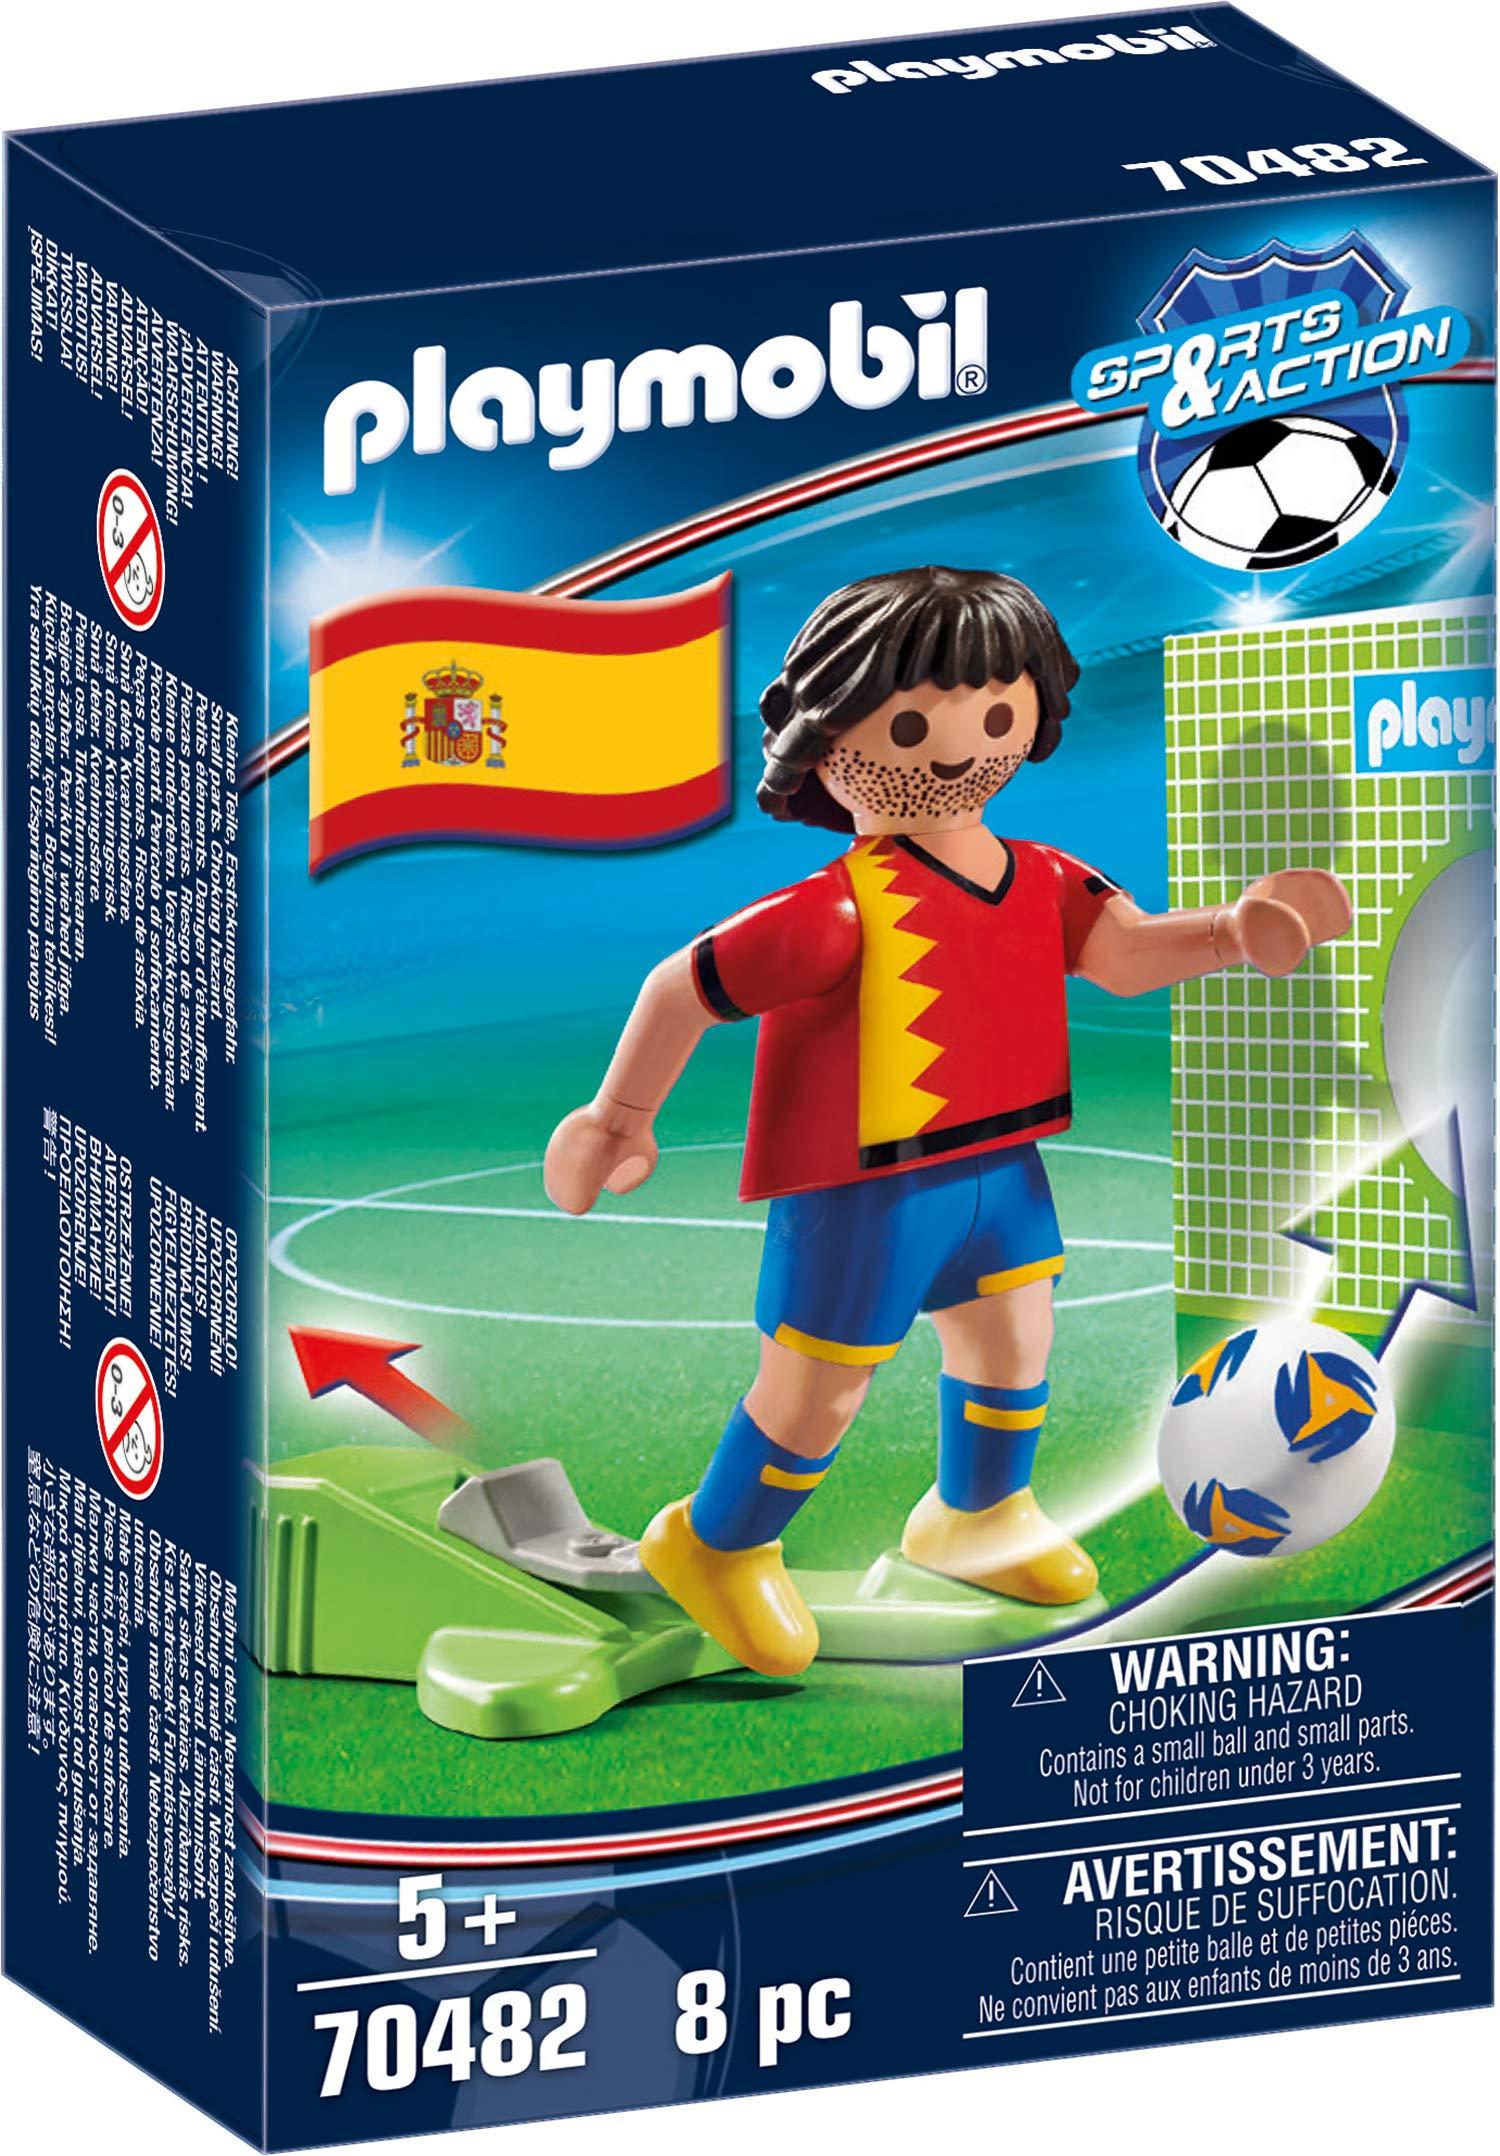 PLAYMOBIL-Jugador de fútbol, España (70482), color spain: Amazon ...